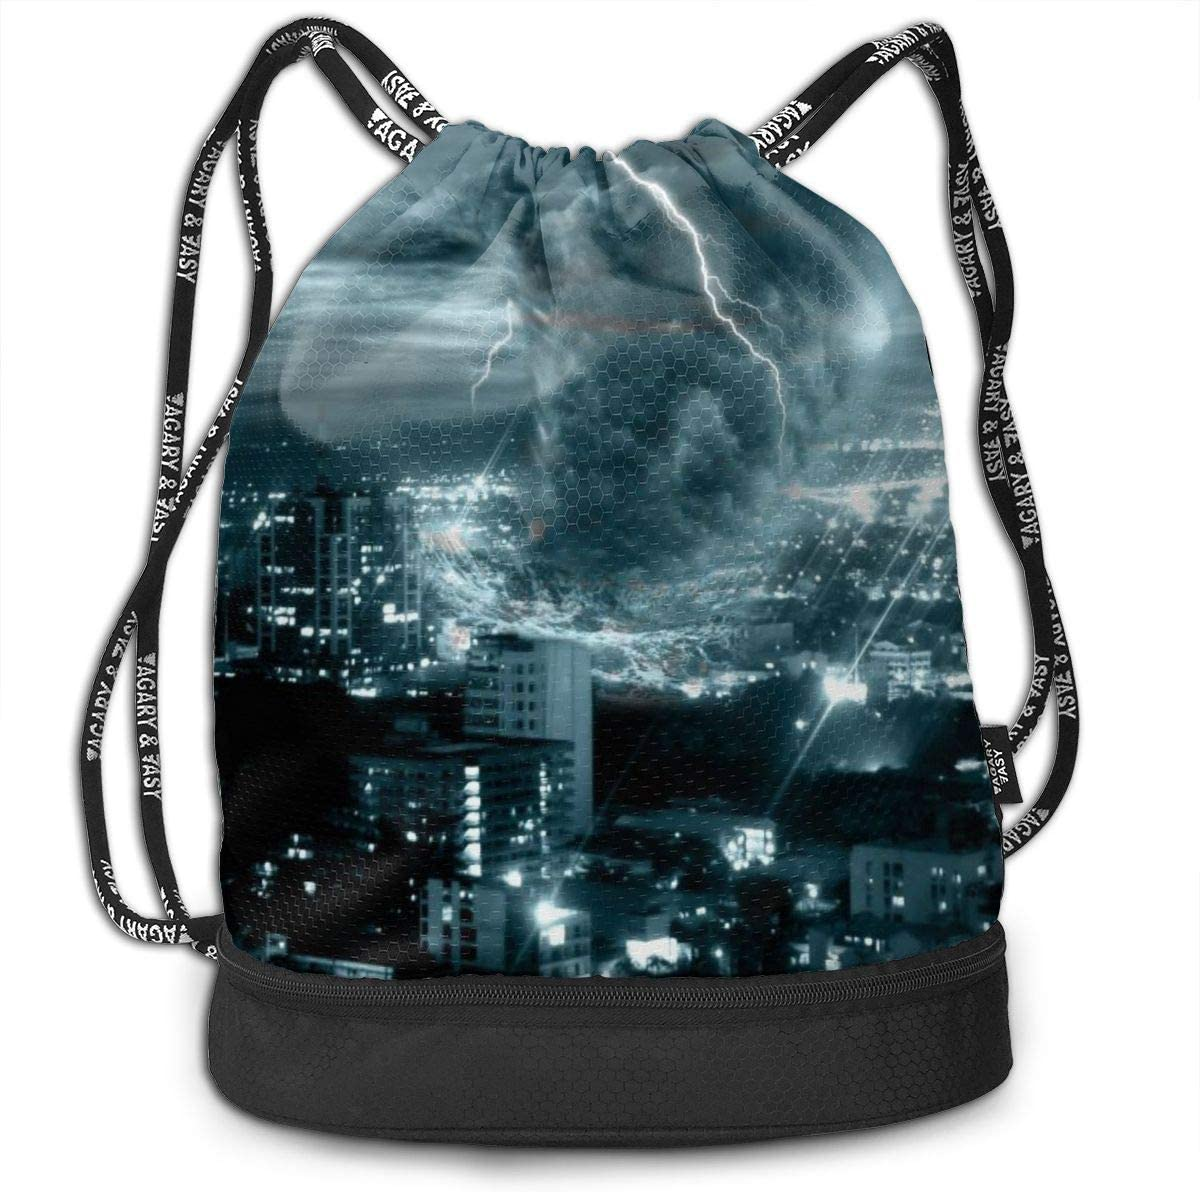 Women Sport Cinch Pack Backpack for Men Tornado City Printed Sackpack Kji Gym Sack Drawstring Bag